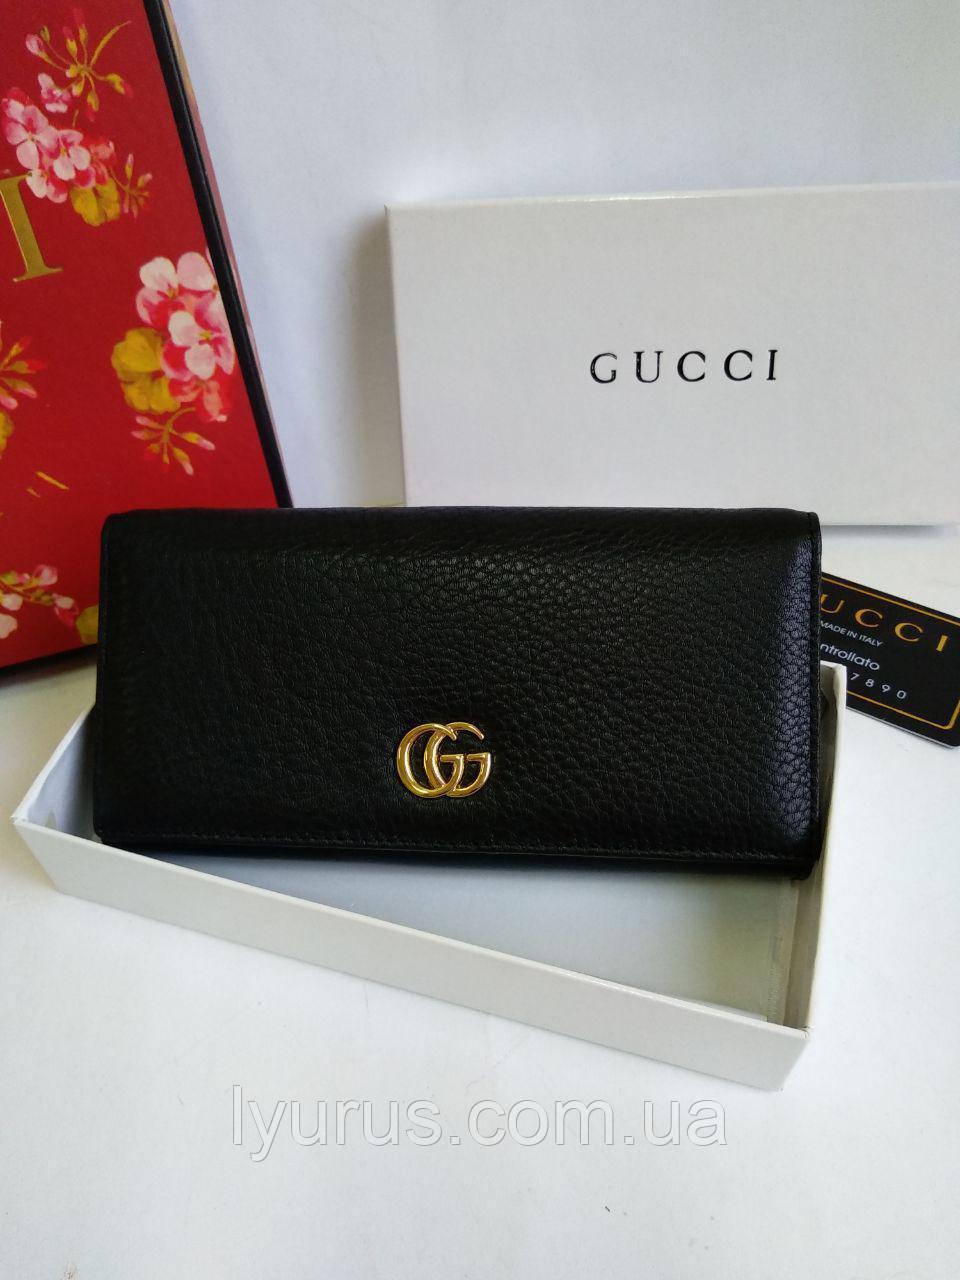 Женский кожаный кошелек бренда  Gucci